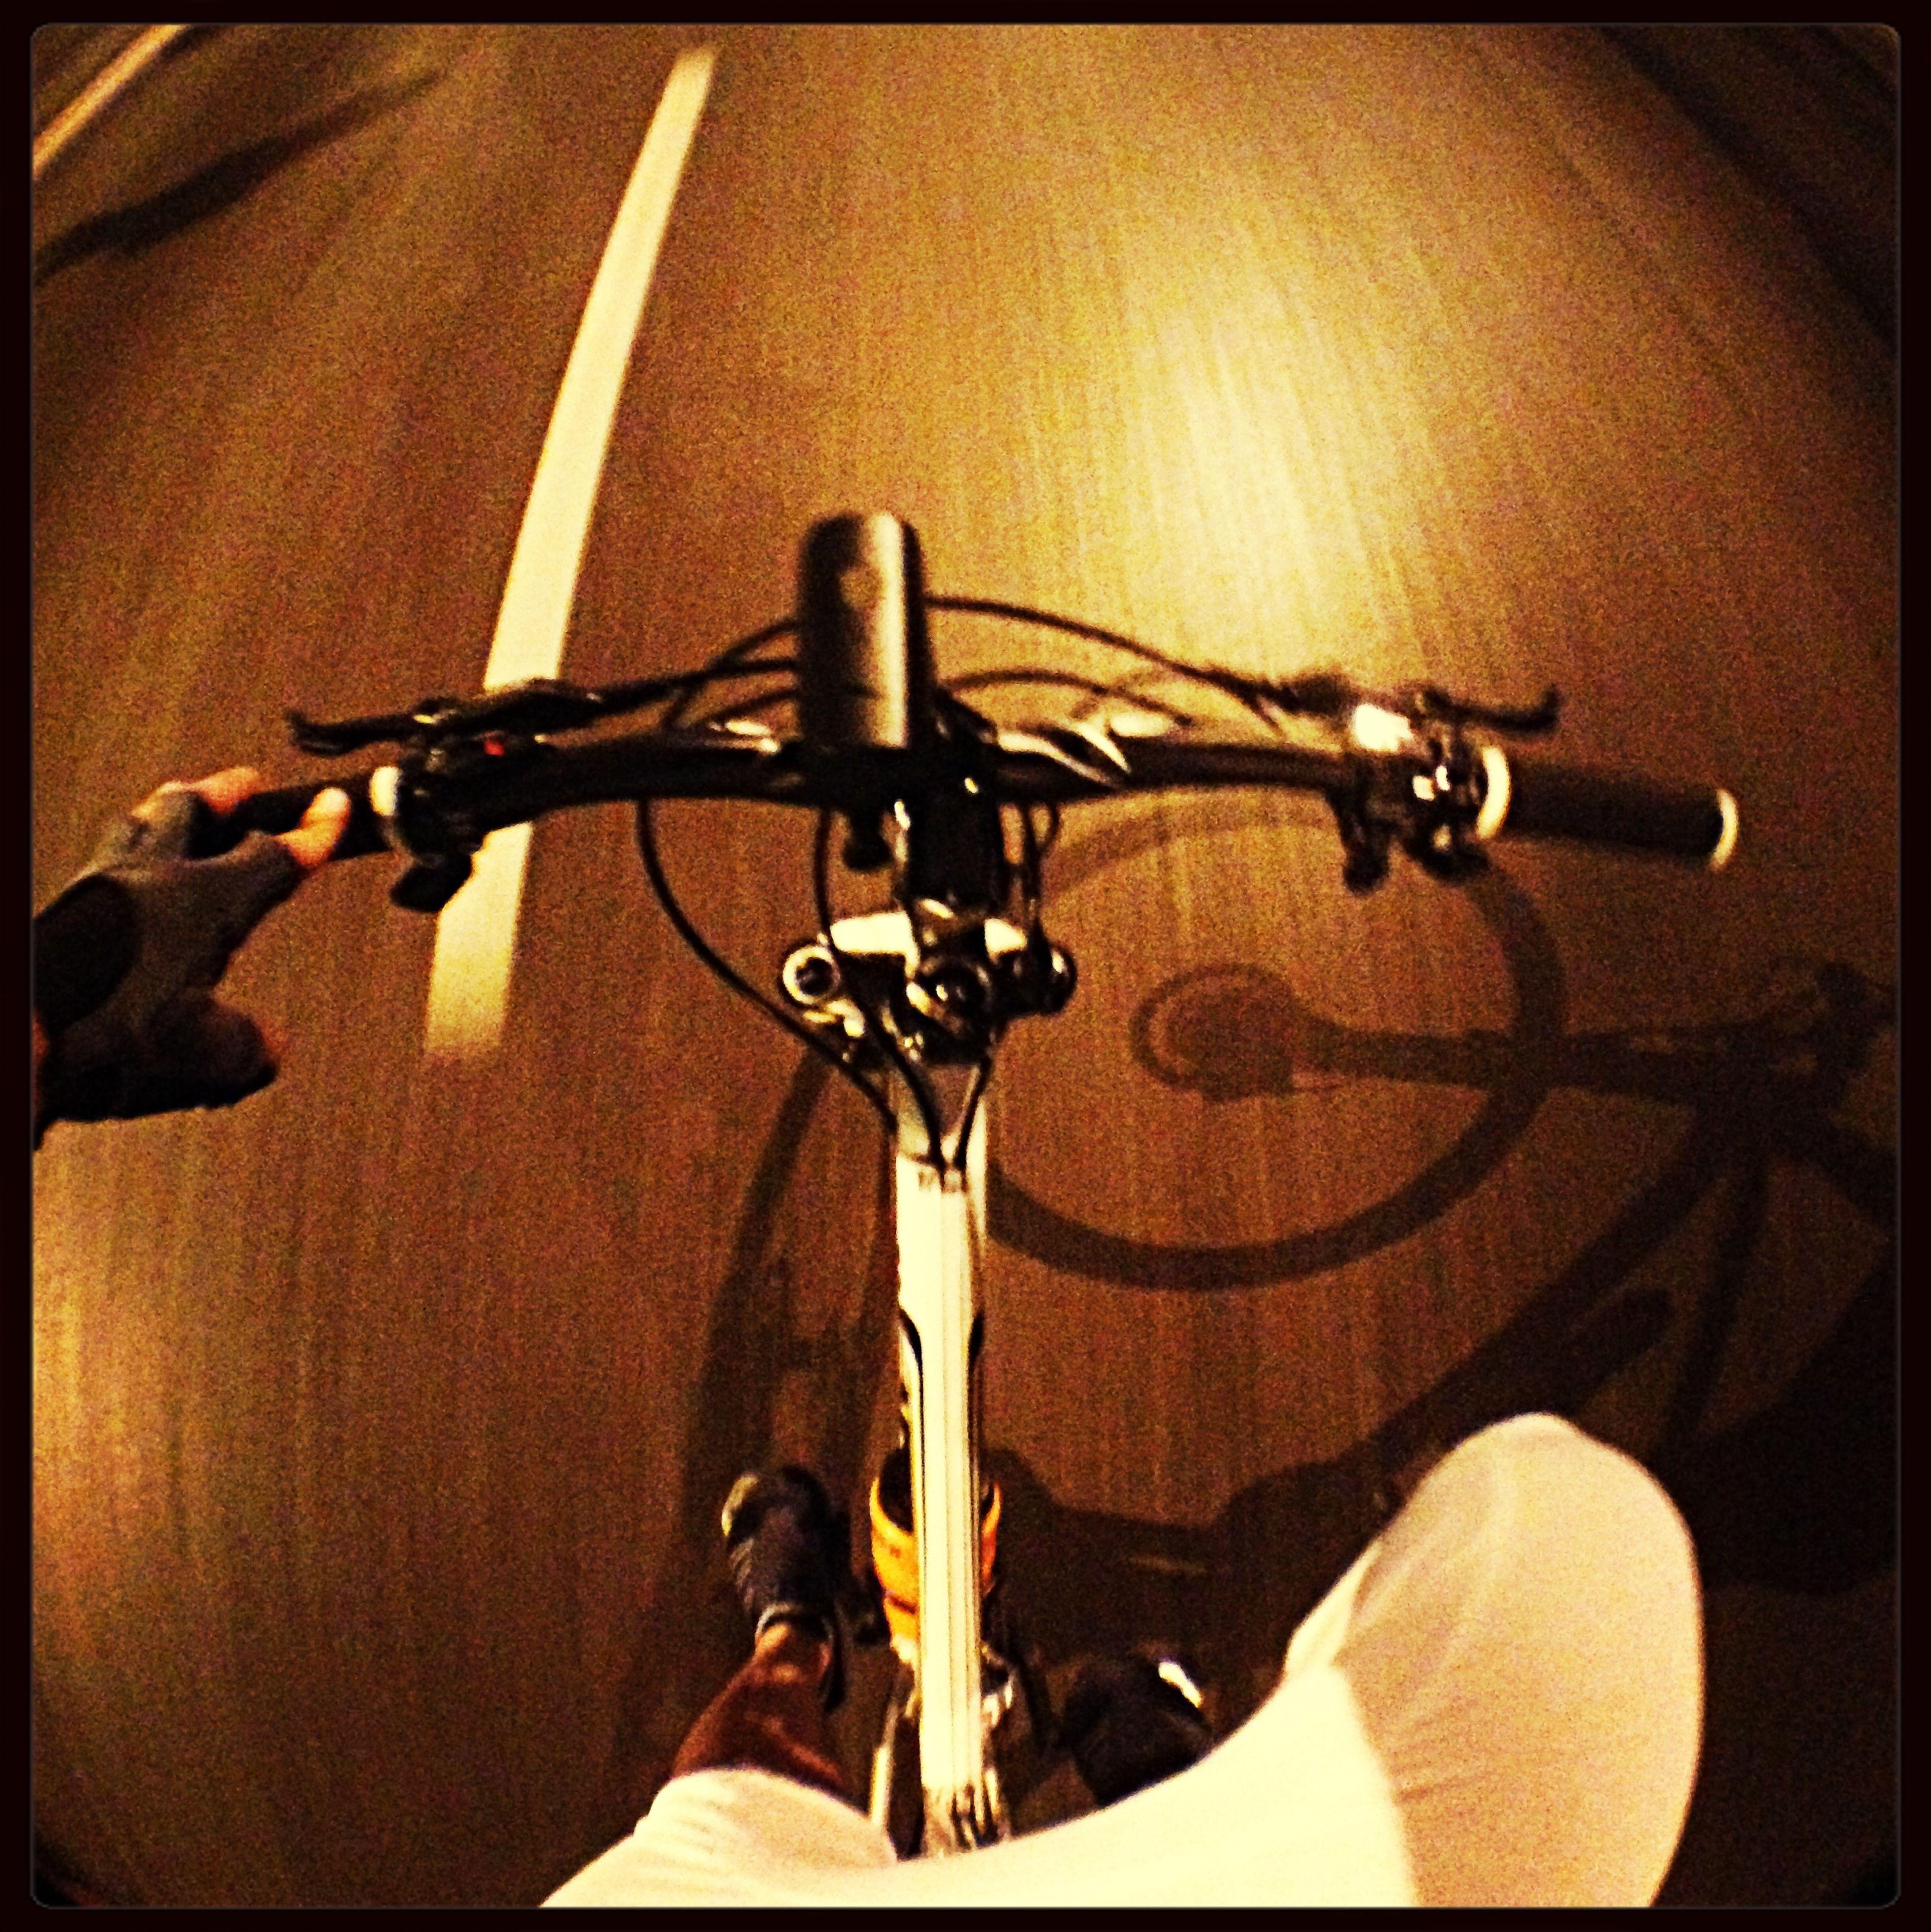 Bici Critica de Madrid Olloclip Fisheye Stree Photography